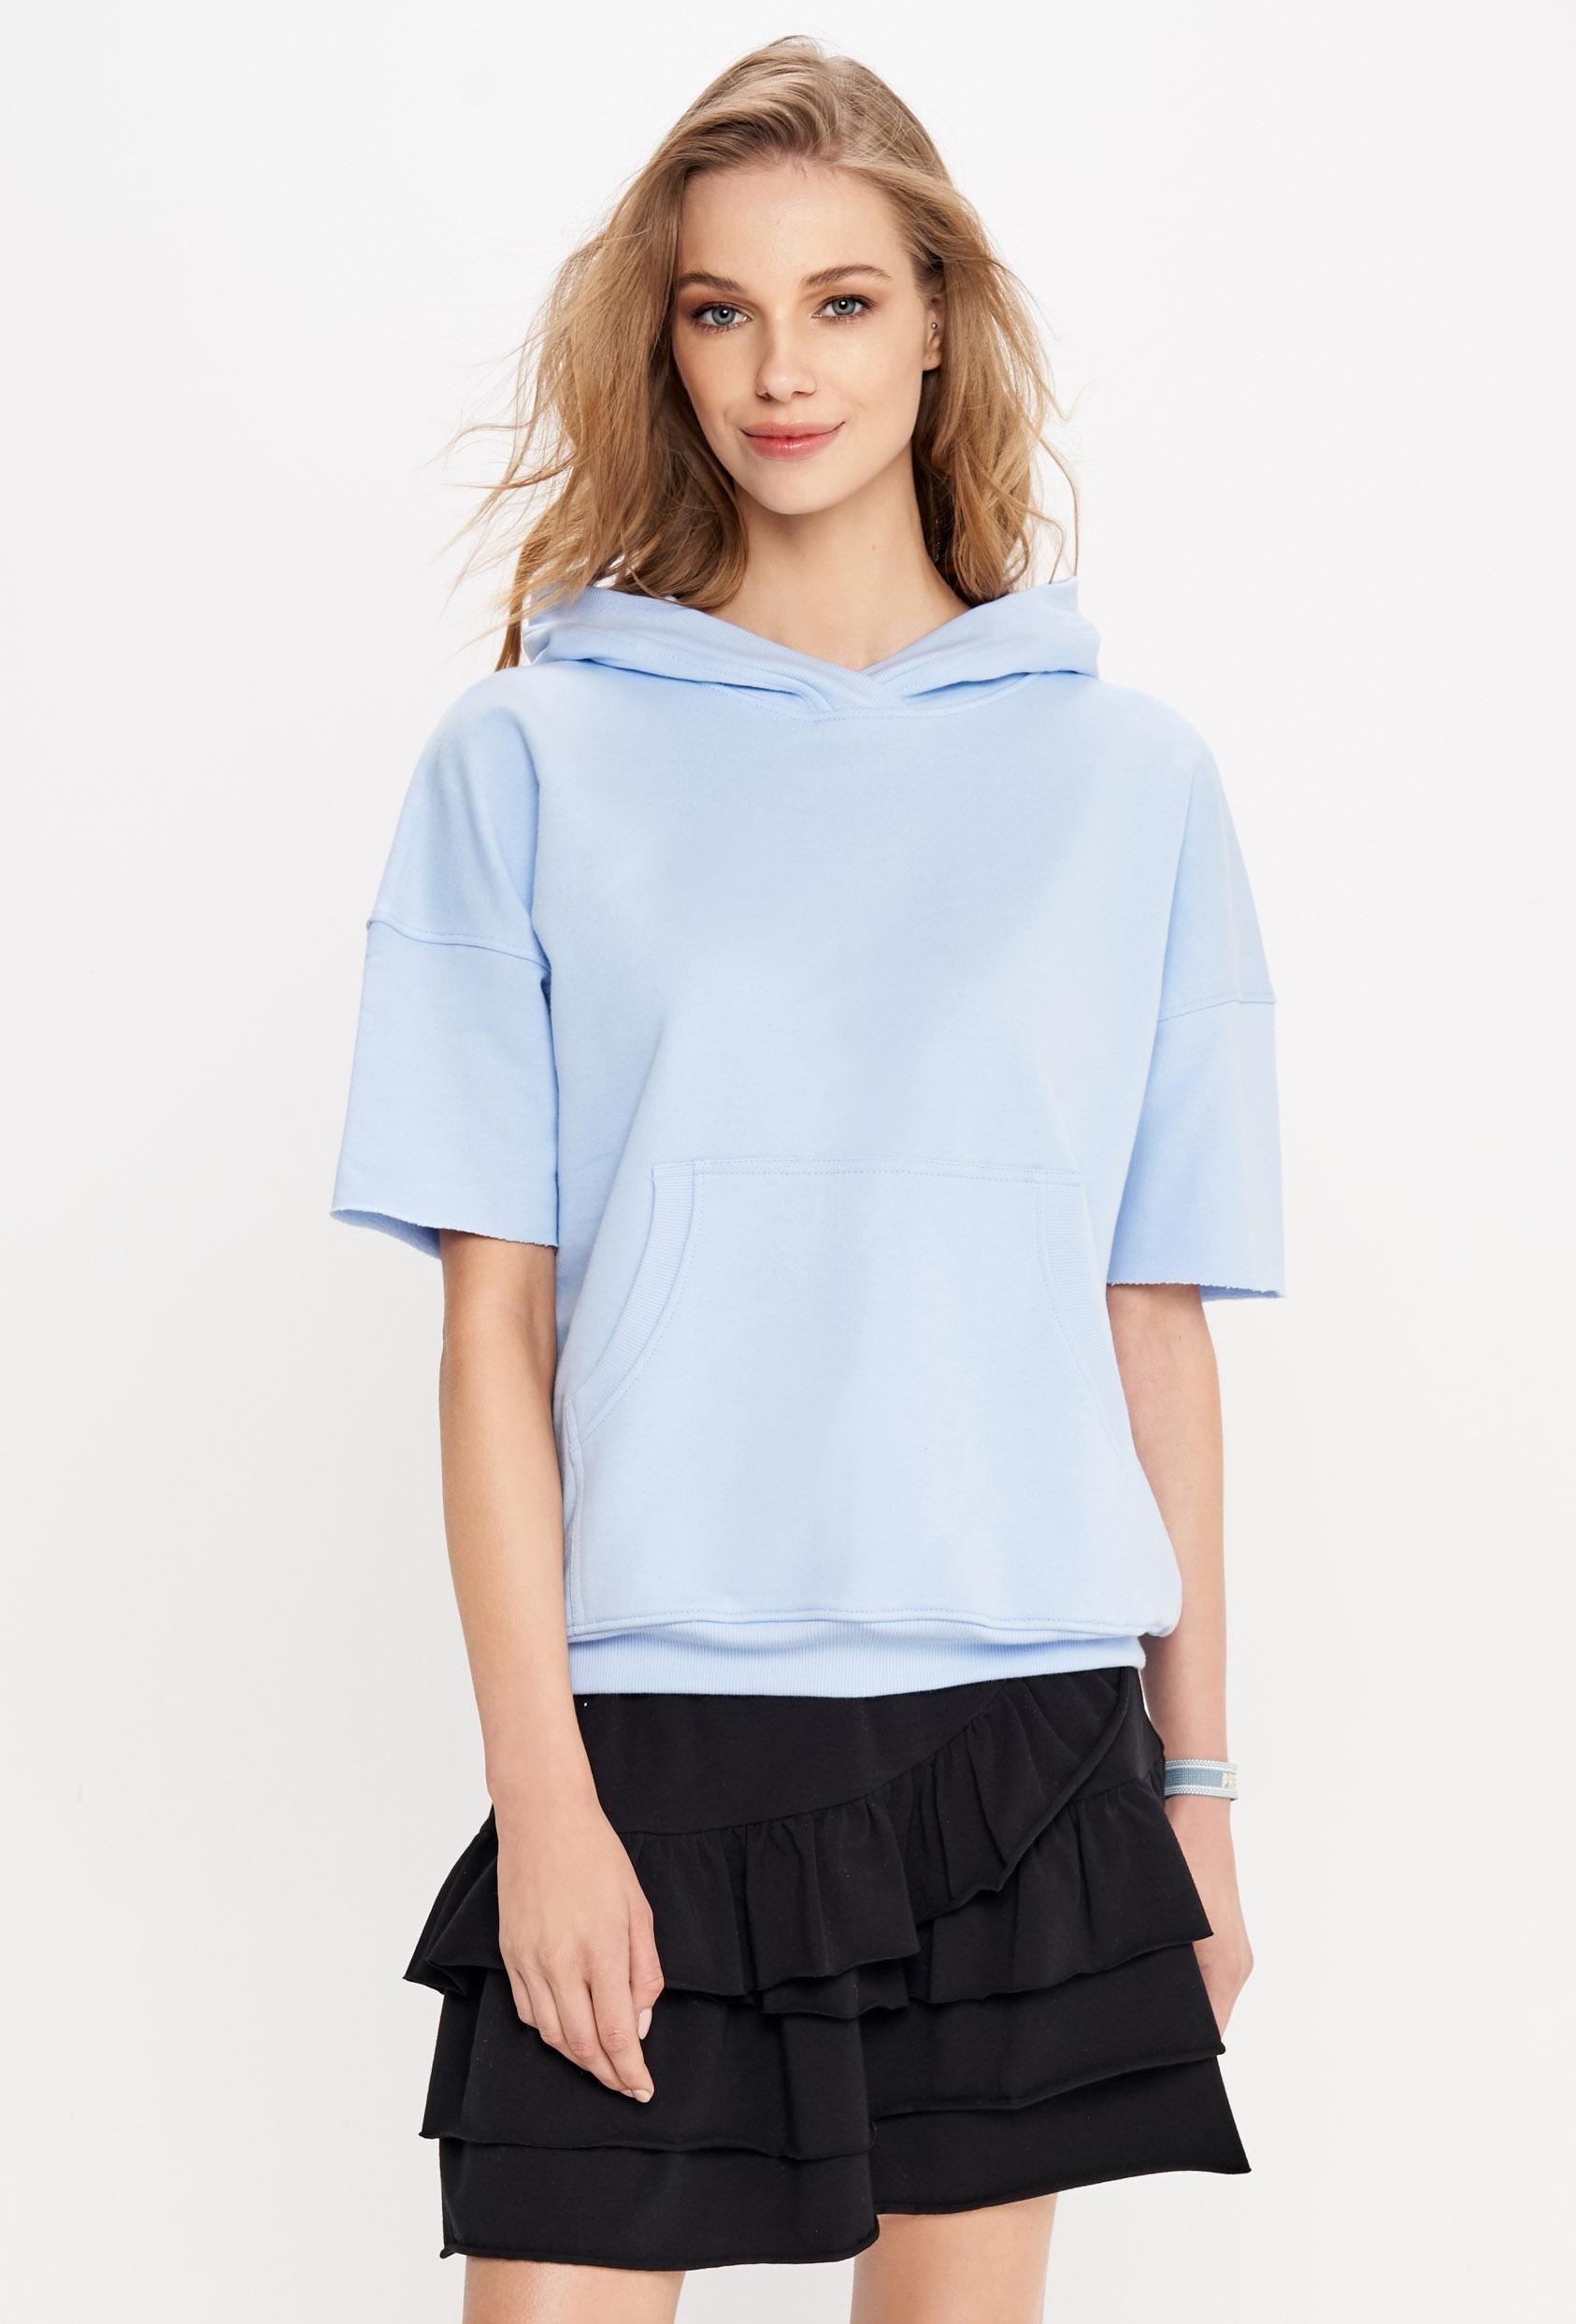 Bluza z kapturem CLEMENCE JUMPER błękitna